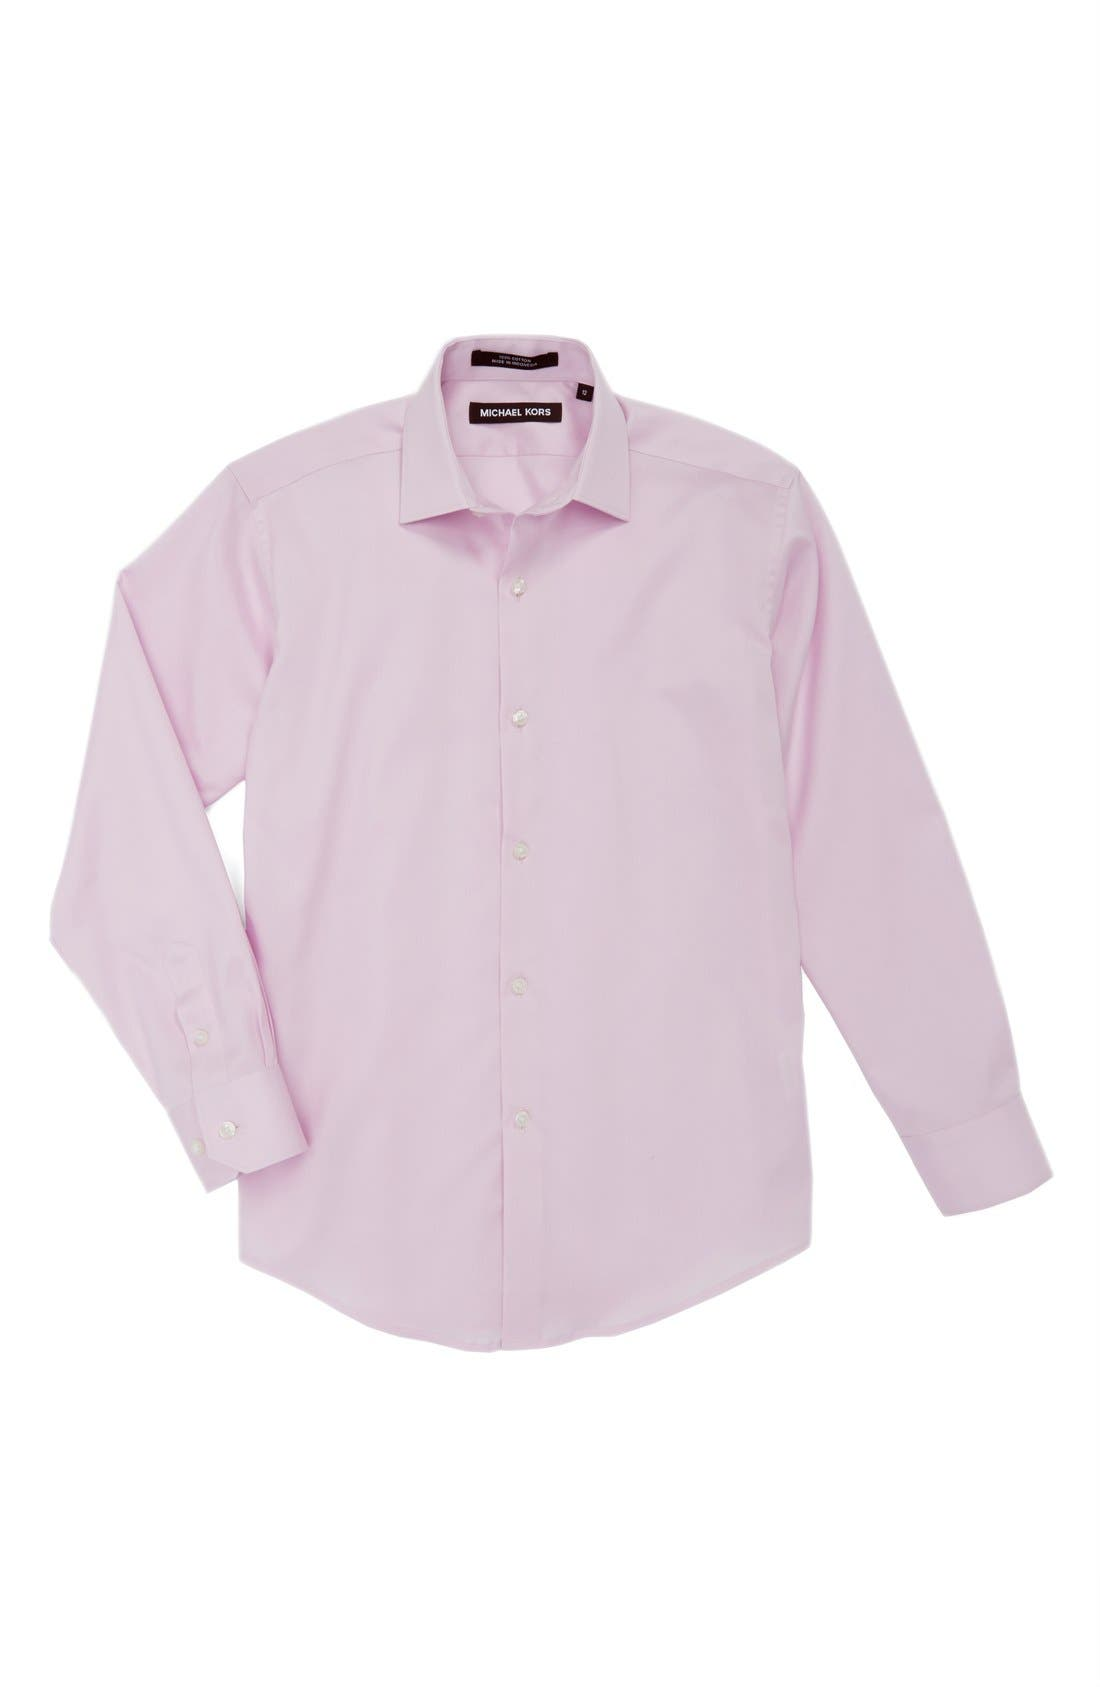 MICHAEL KORS Woven Cotton Dress Shirt, Main, color, ROSE